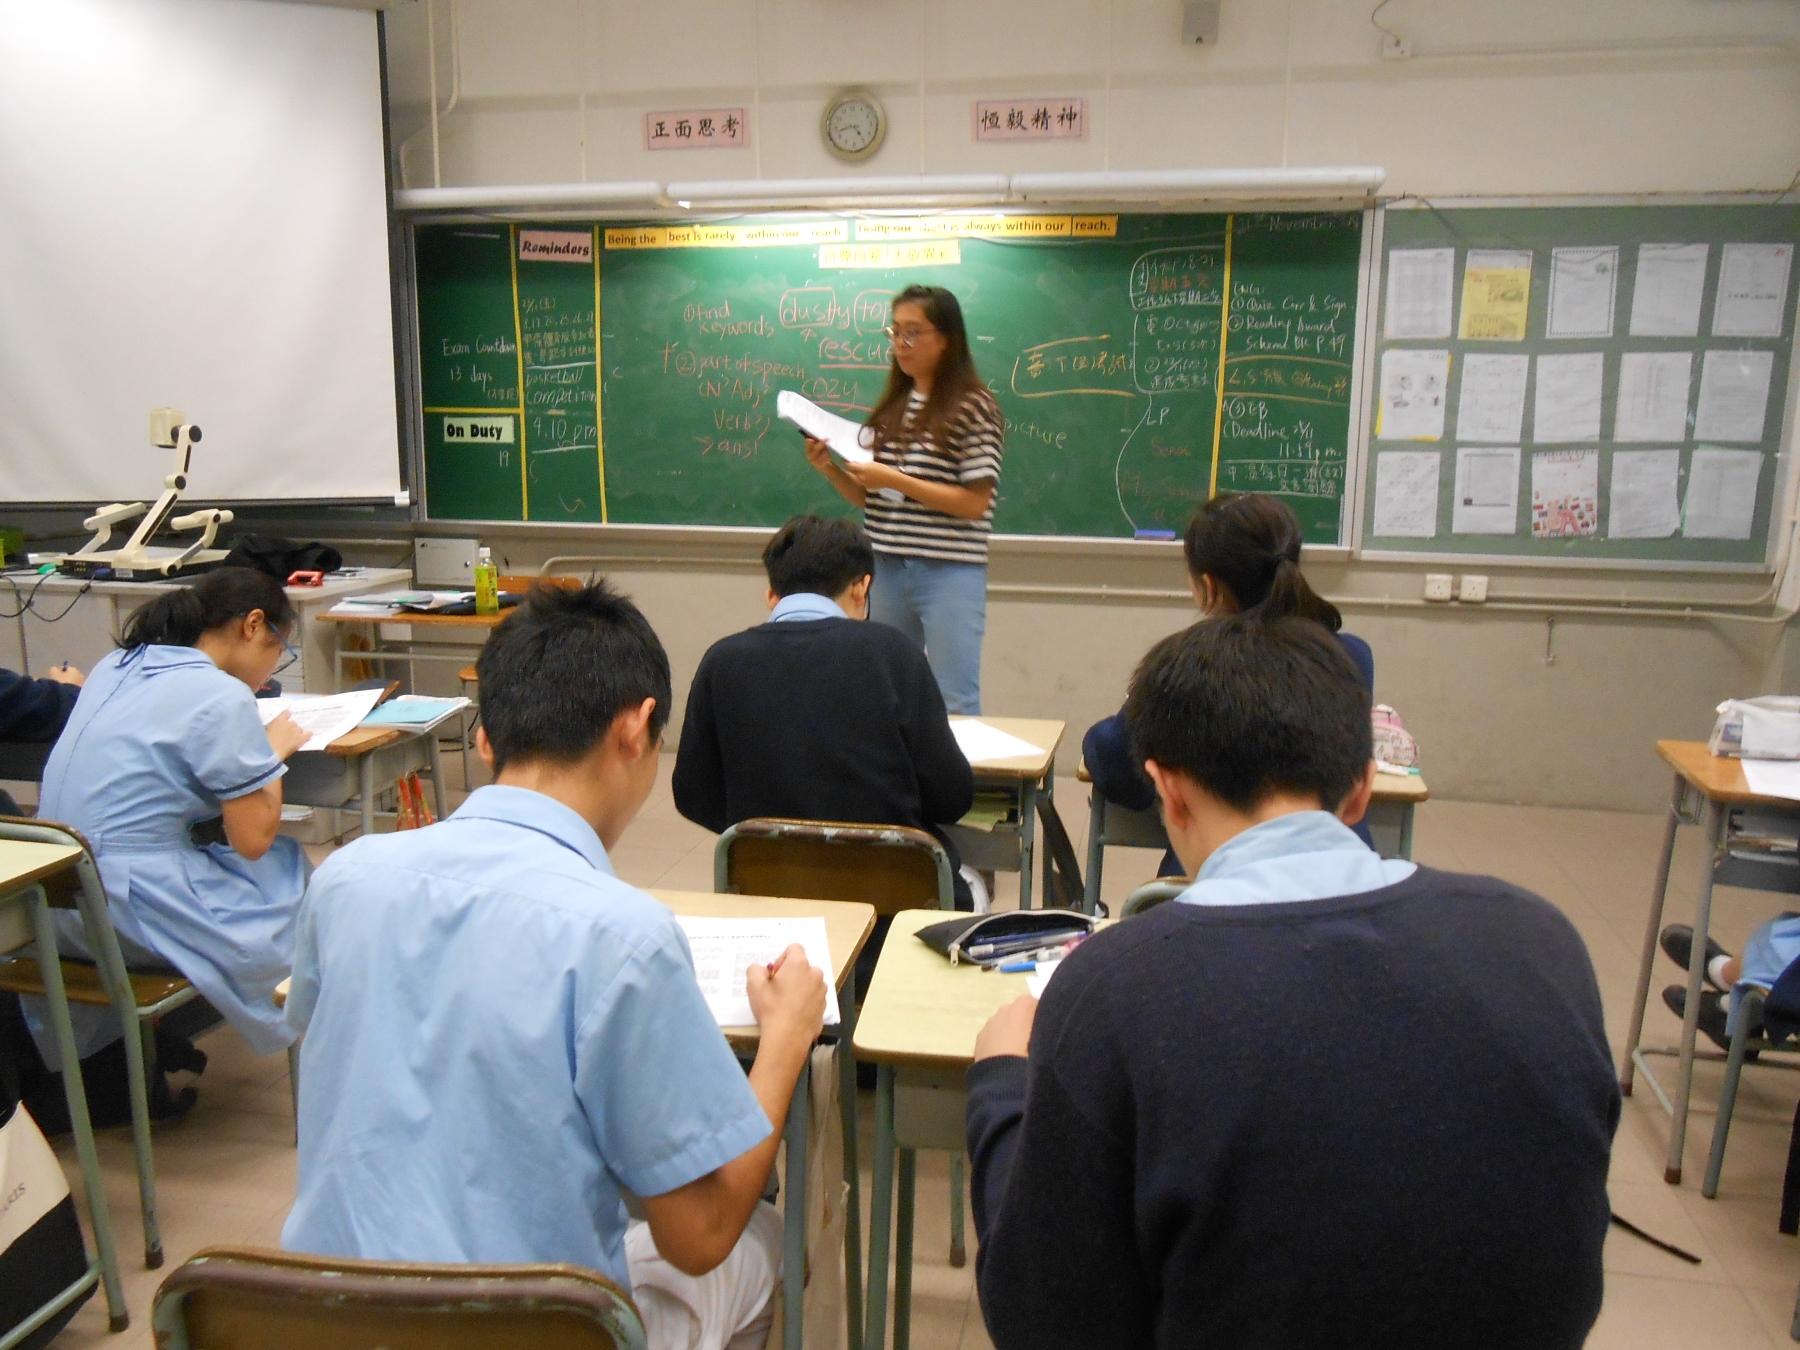 http://npc.edu.hk/sites/default/files/dscn8901.jpg